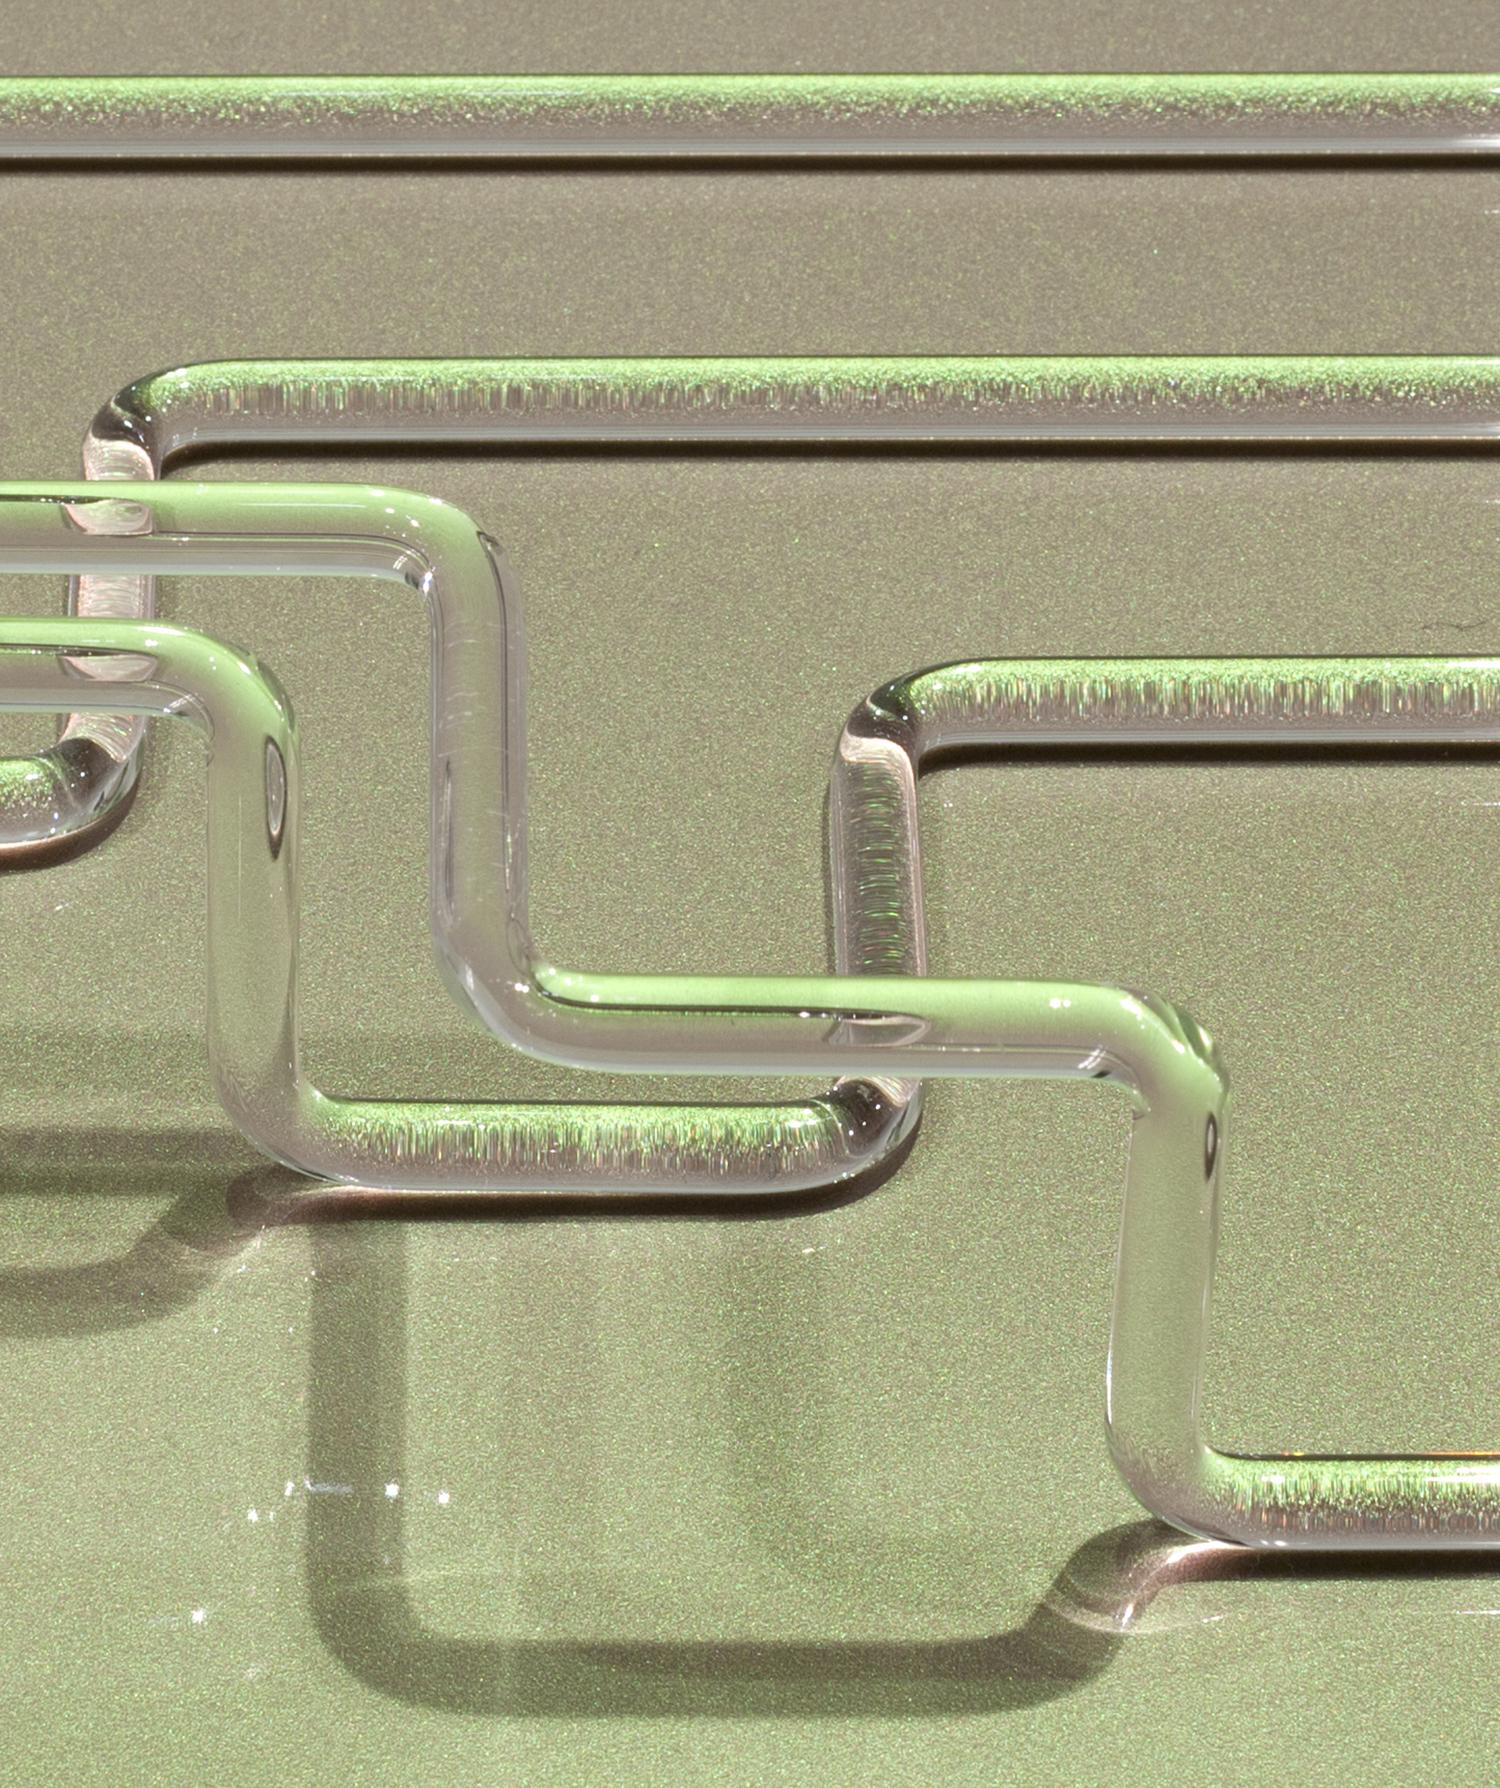 0540_Z A Flexible Fabric of Inflexible Parts crop 4.jpg